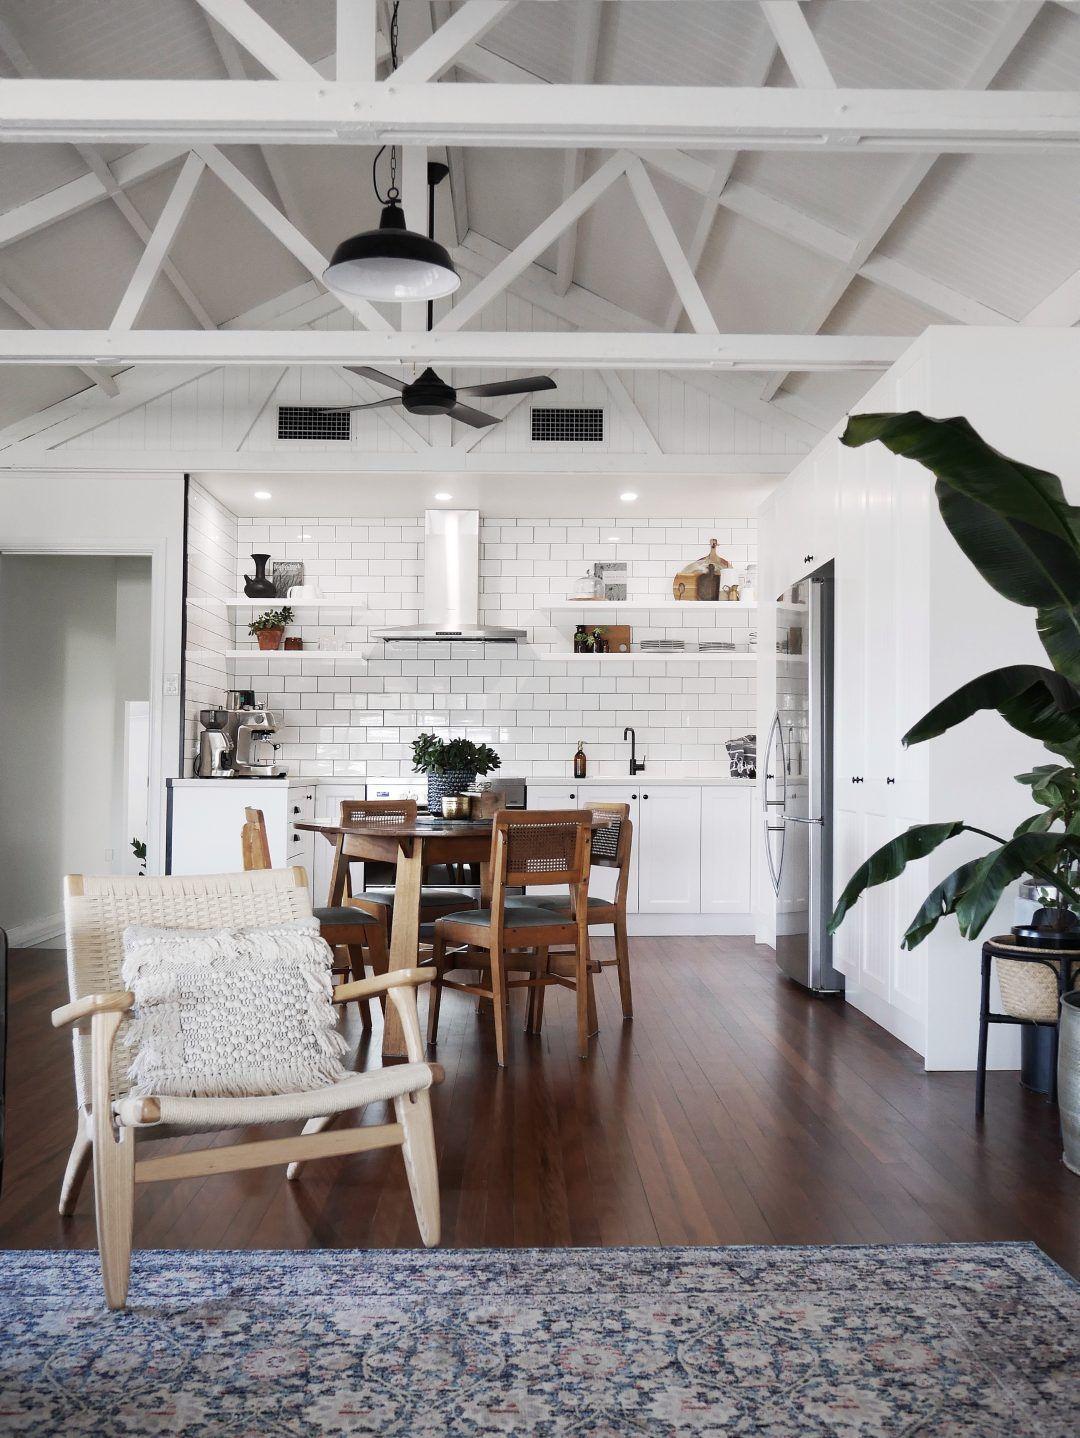 Chic boho coastal home tour | Home decor styles, Coastal ...